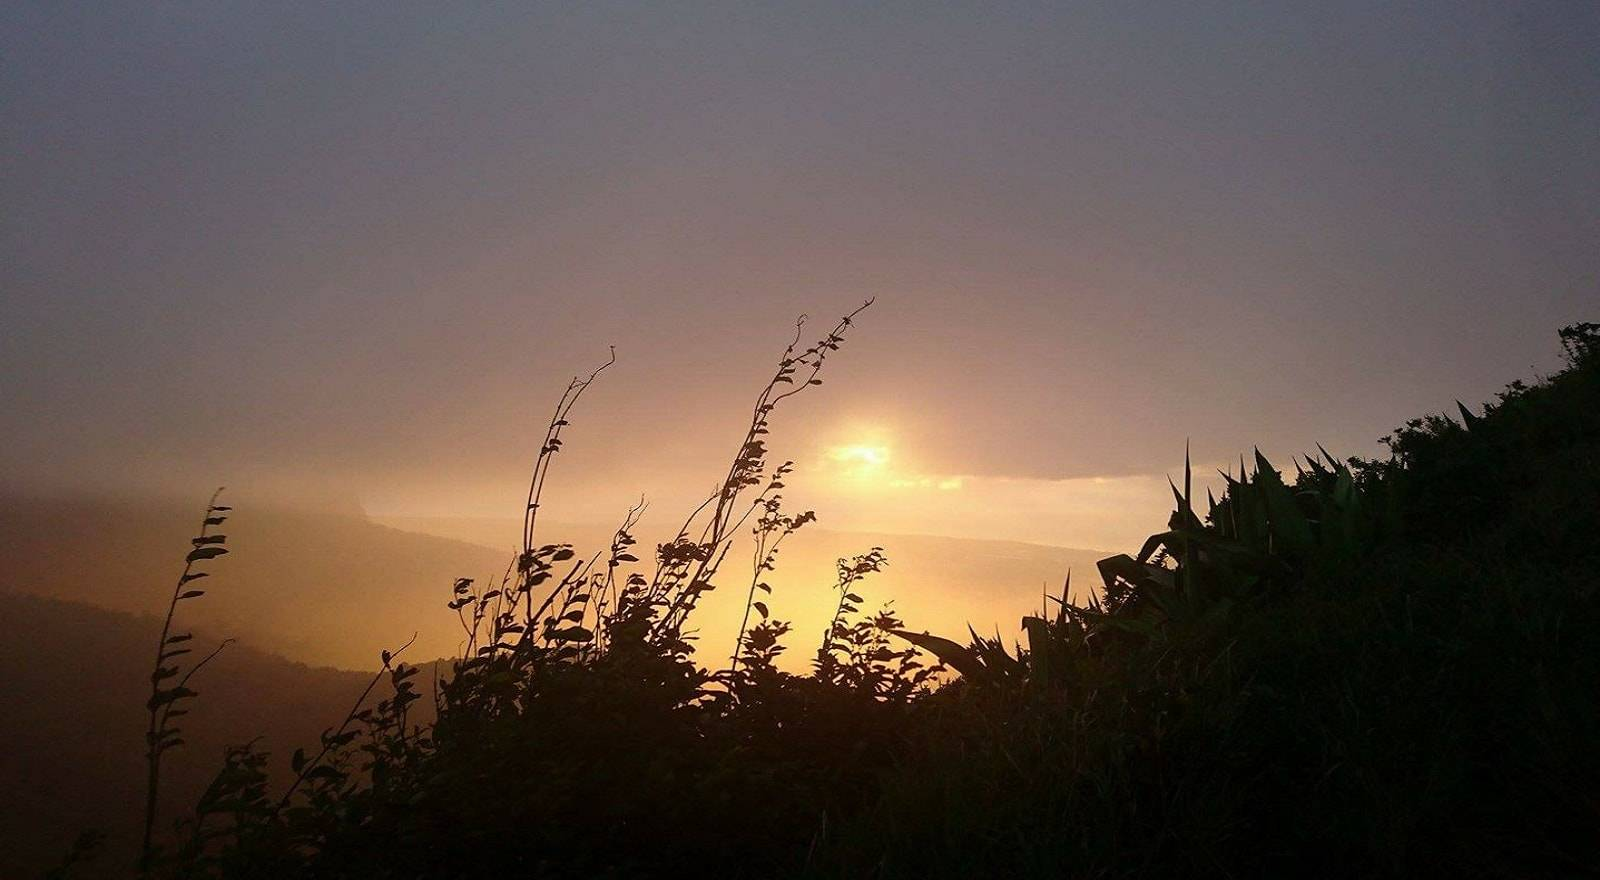 Le Pouce Sunset Hike, Le Pouce Sunset Hike